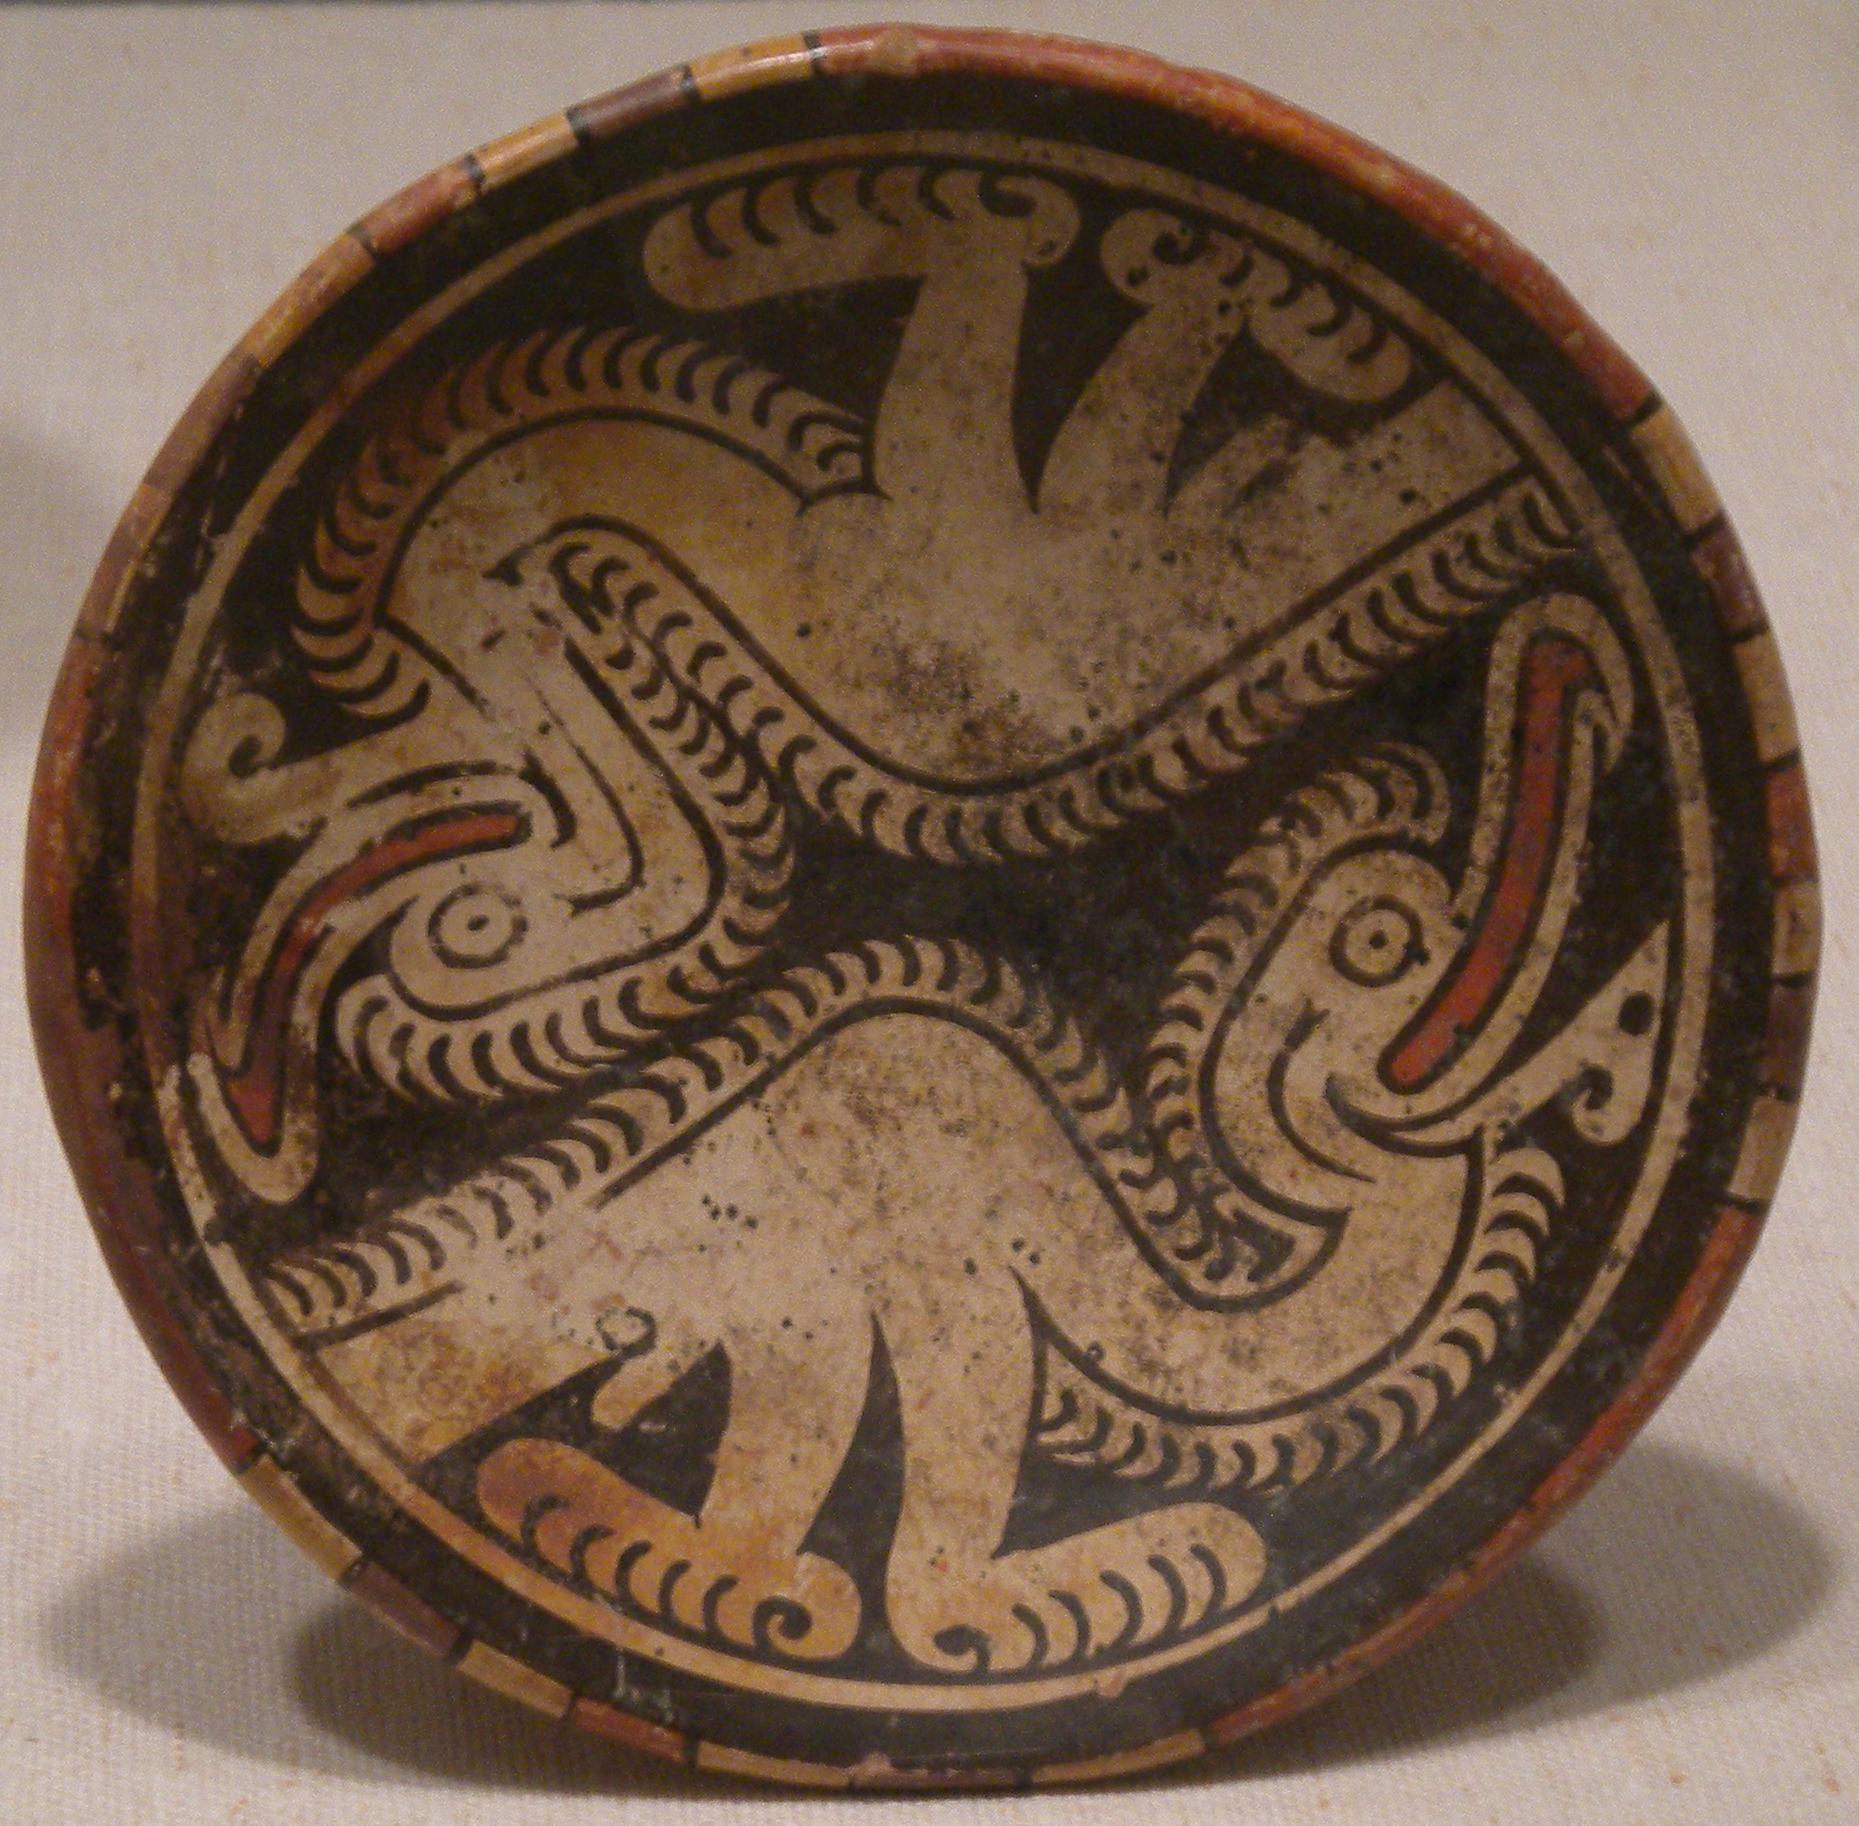 Pedestal Plate, Sitio Conte, Panama